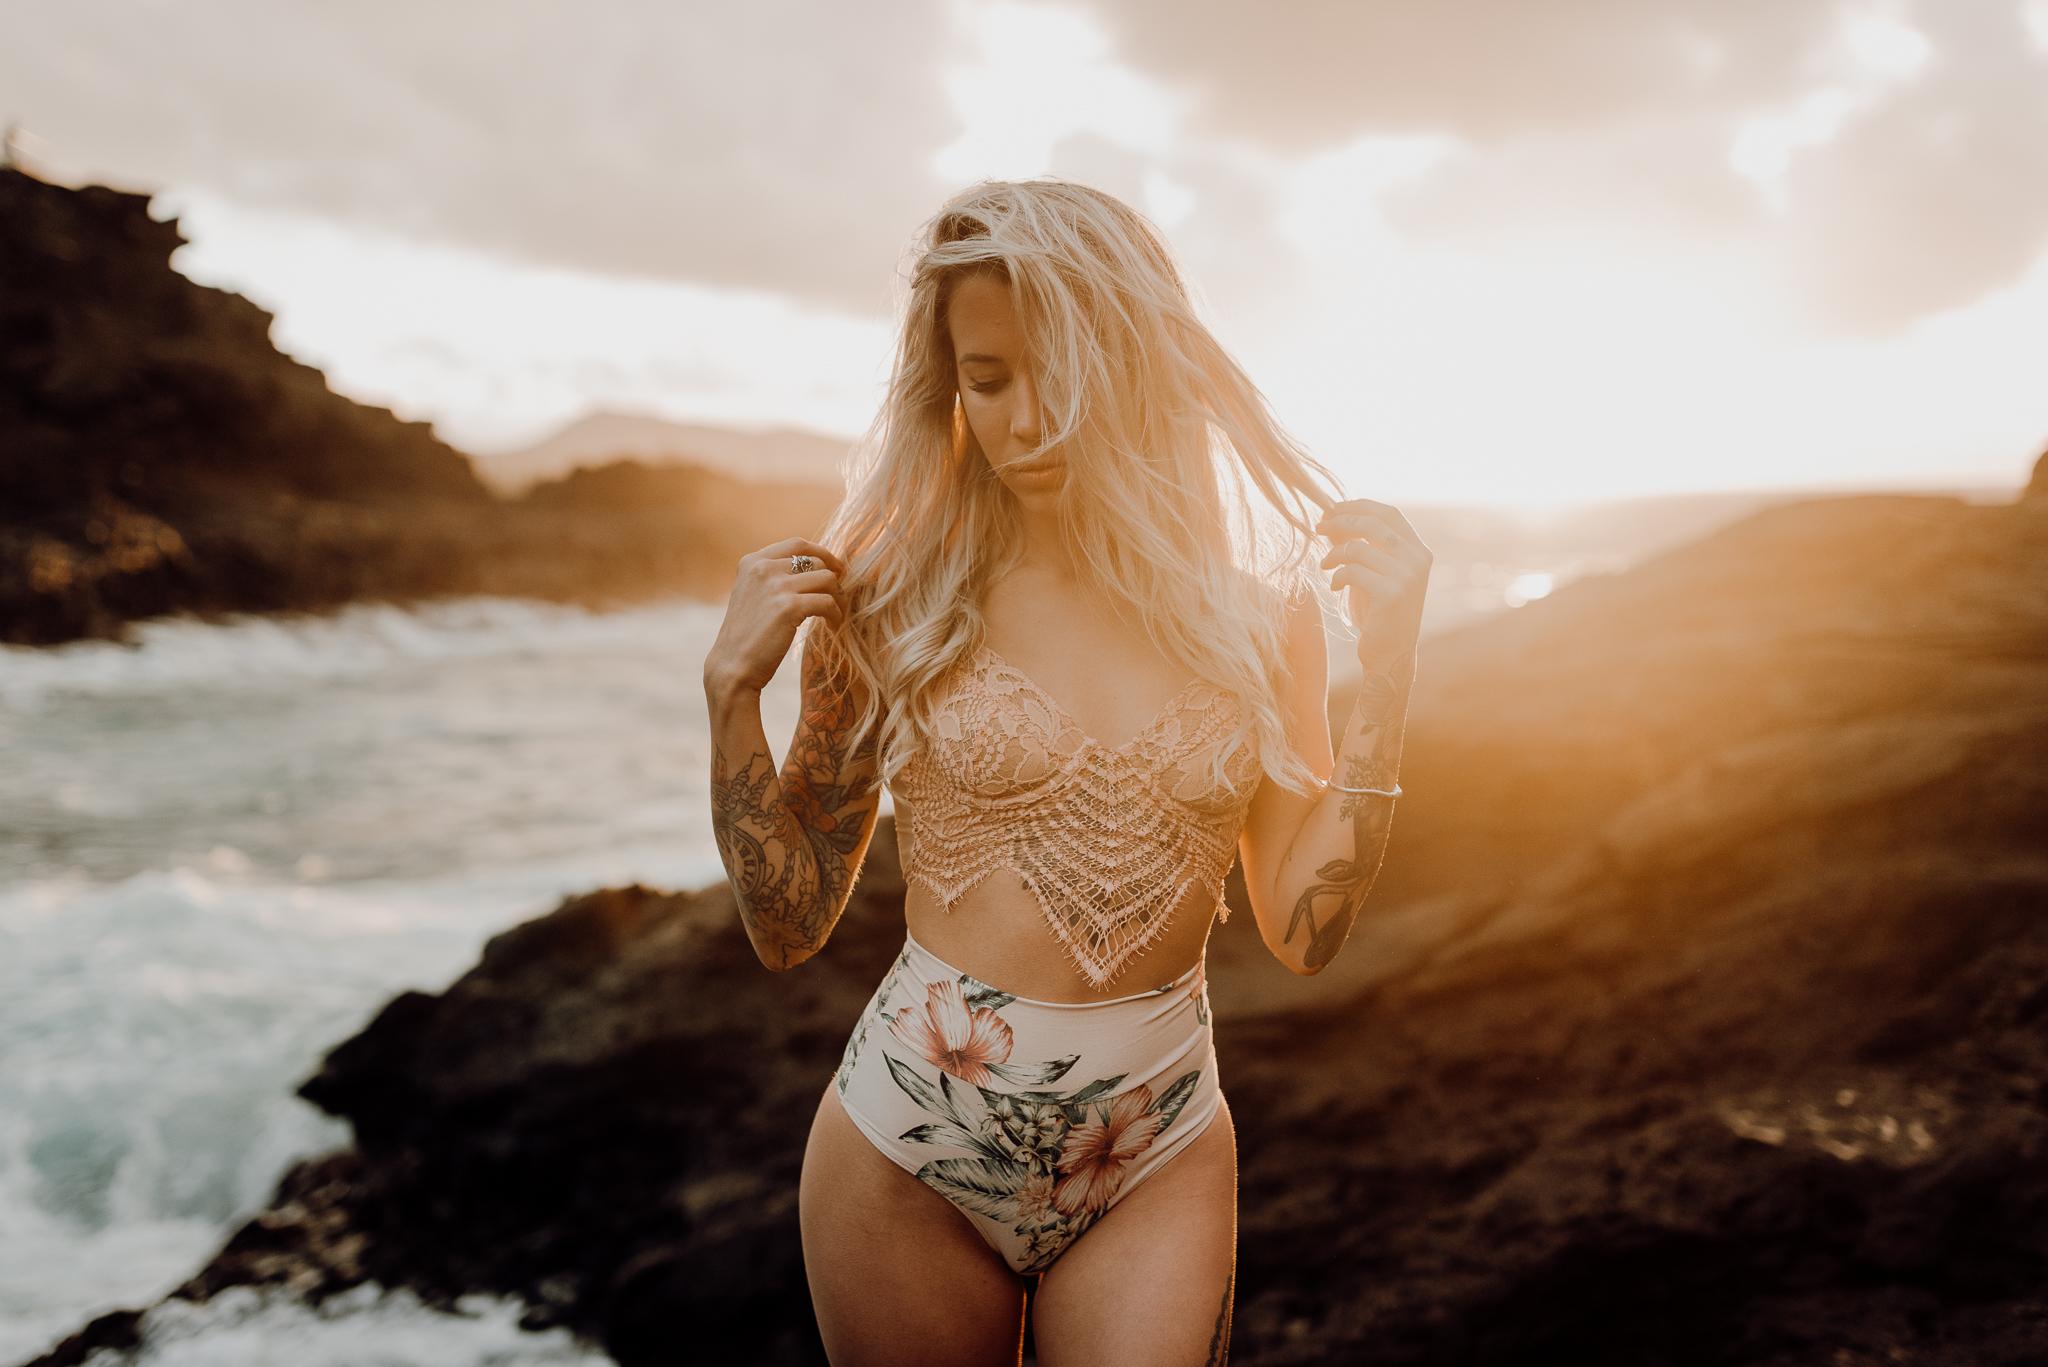 Michelle | Oahu Photographer | Kristen Giles Photography.jpg| Kristen Giles Photography - 003.jpg